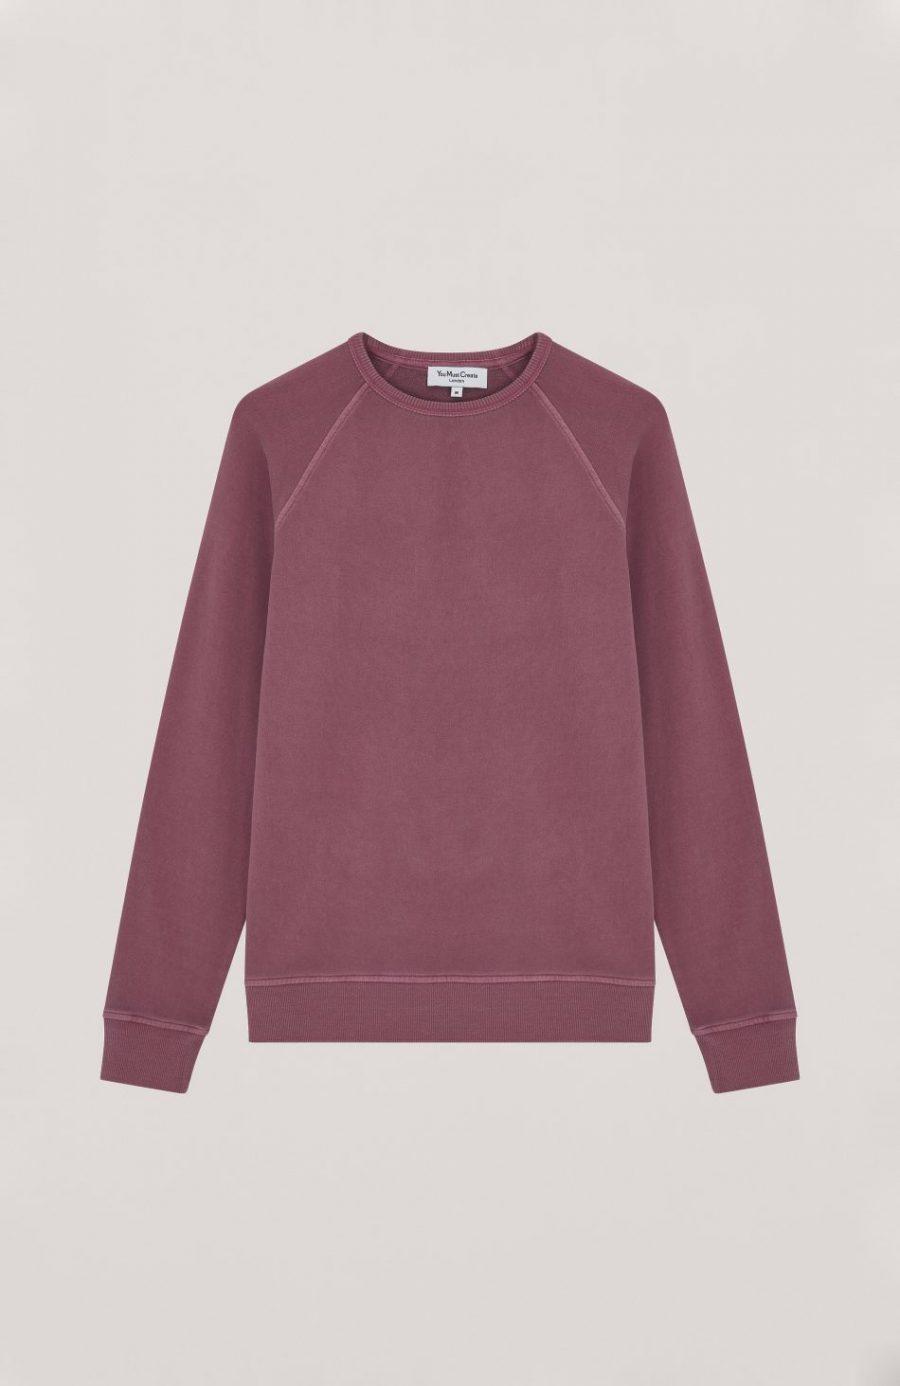 P7NAA-Schrank-Raglan-Sweat-Pink-950×1463